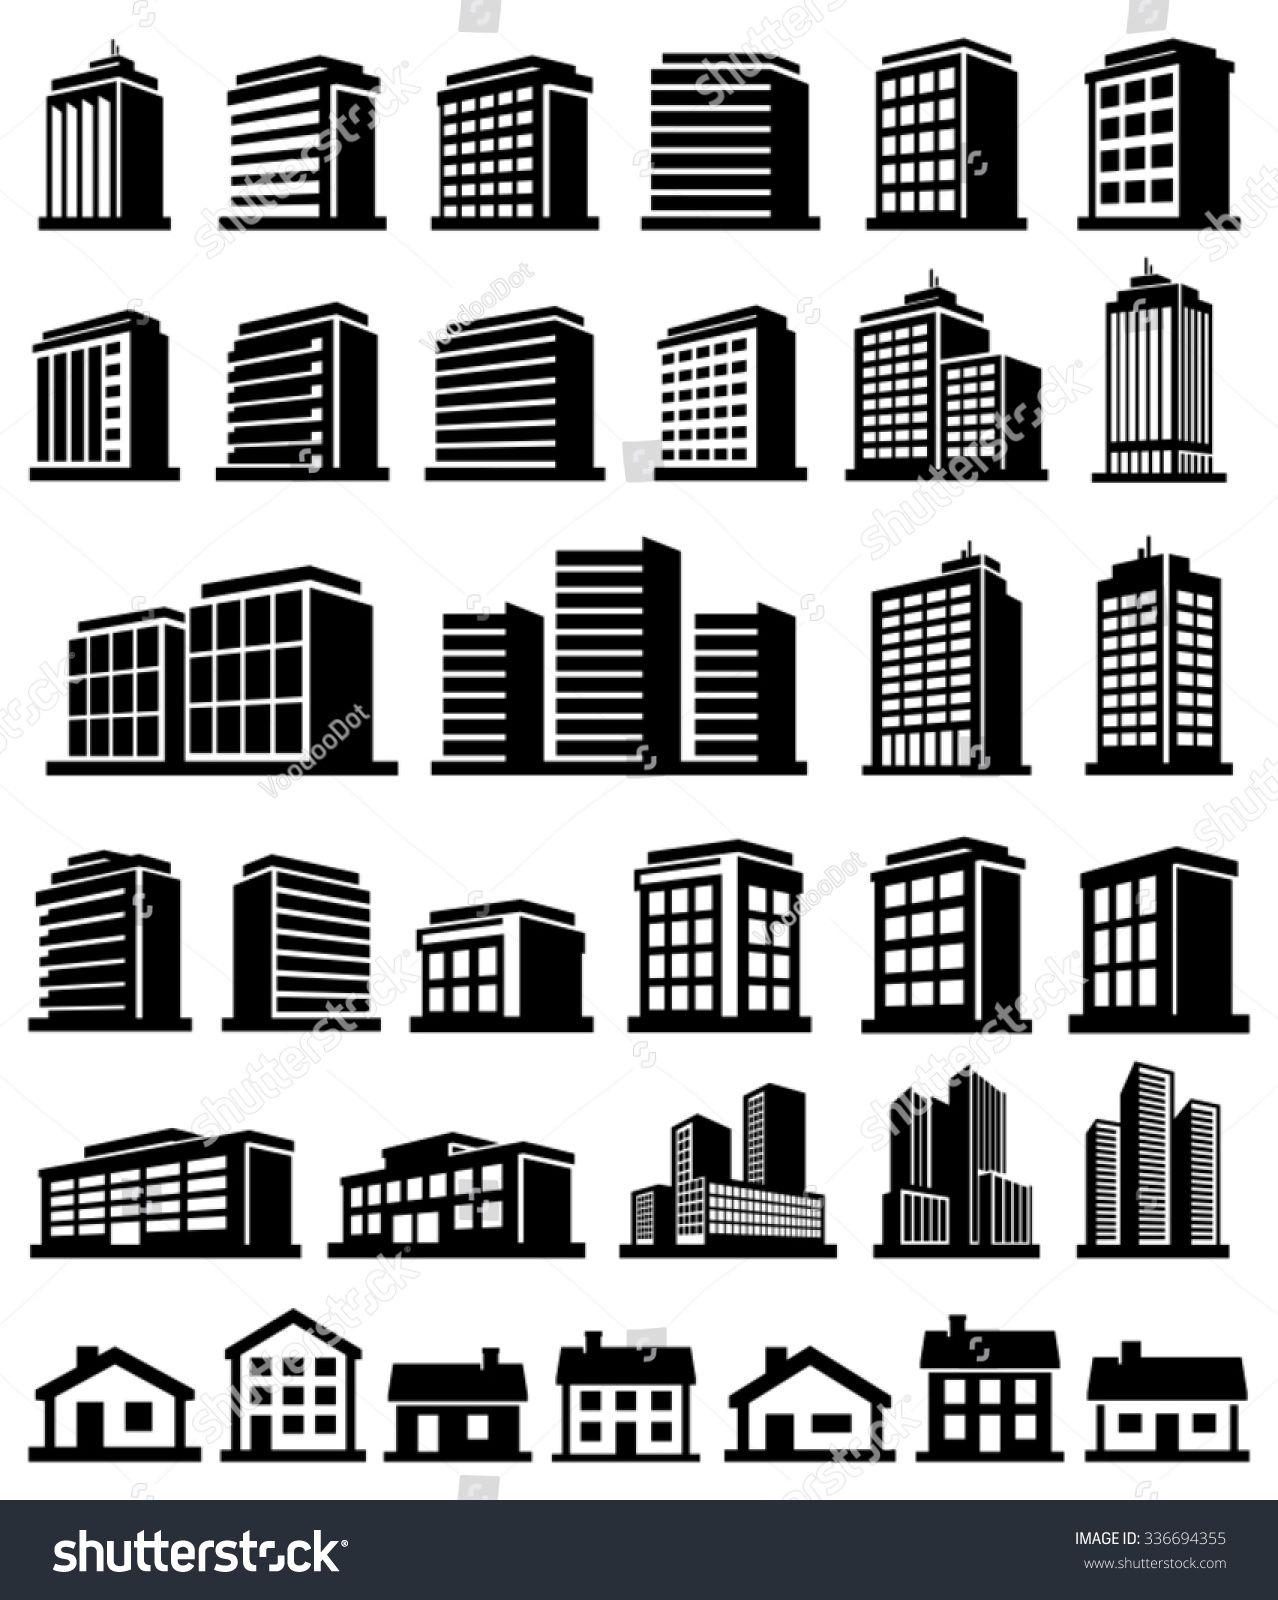 Buildings icons set vector Building icon, Icon set